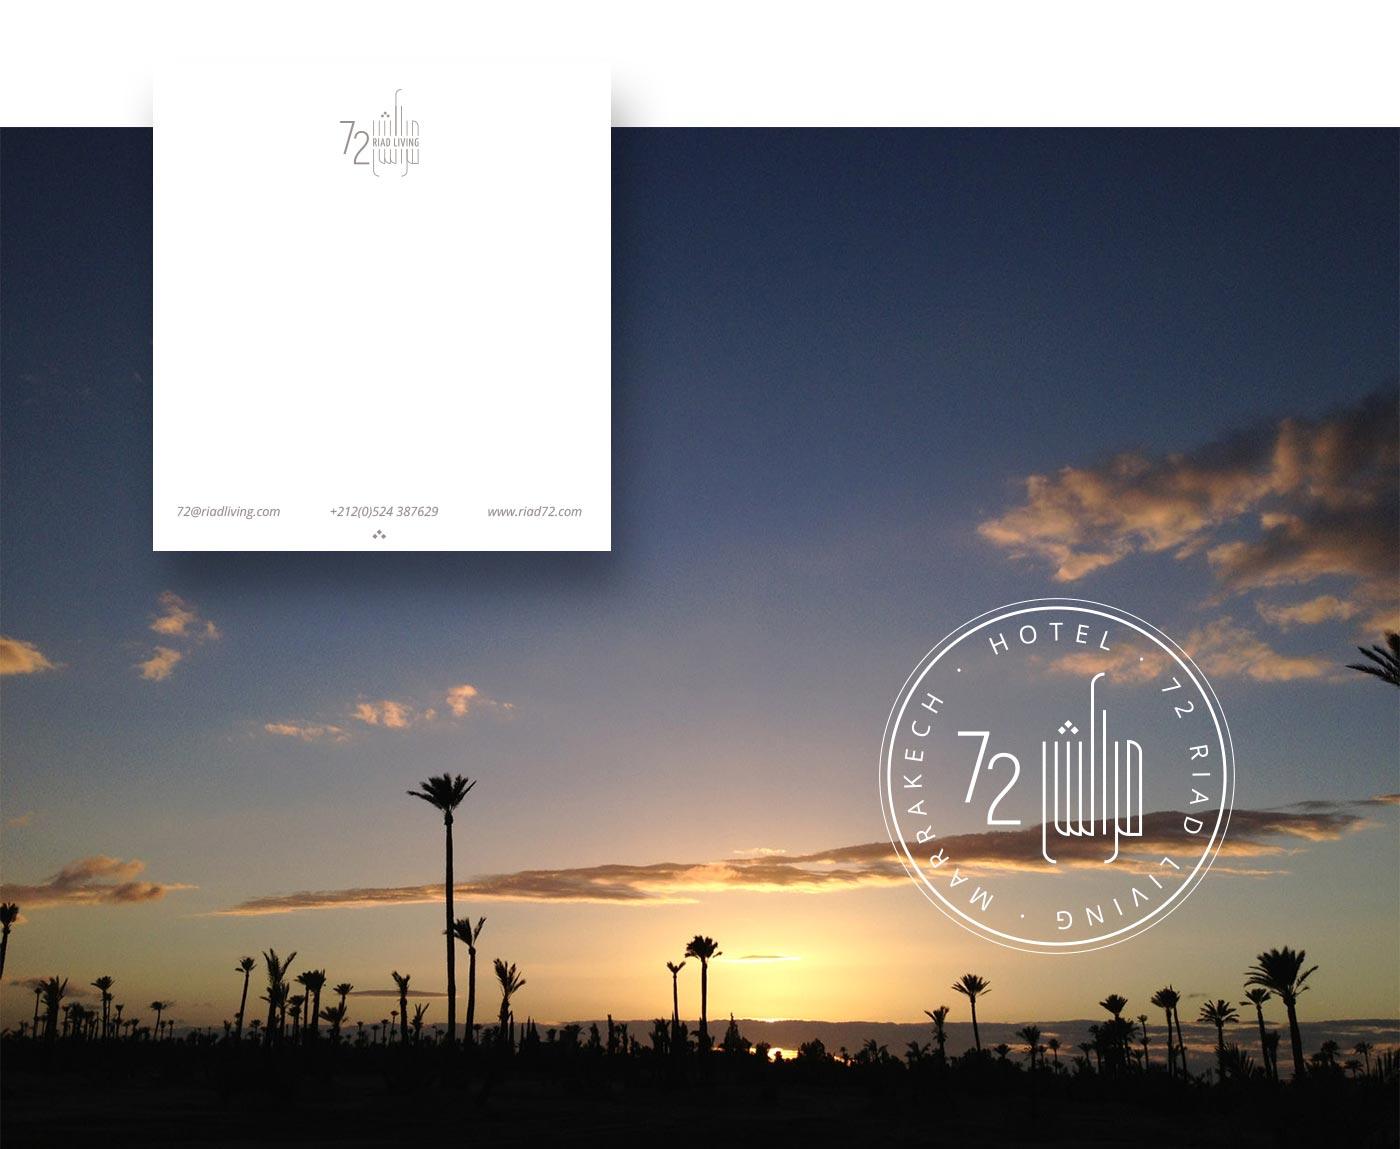 LOGOTIPO RIAD LIVING 72 Marrakech grafico milano 05